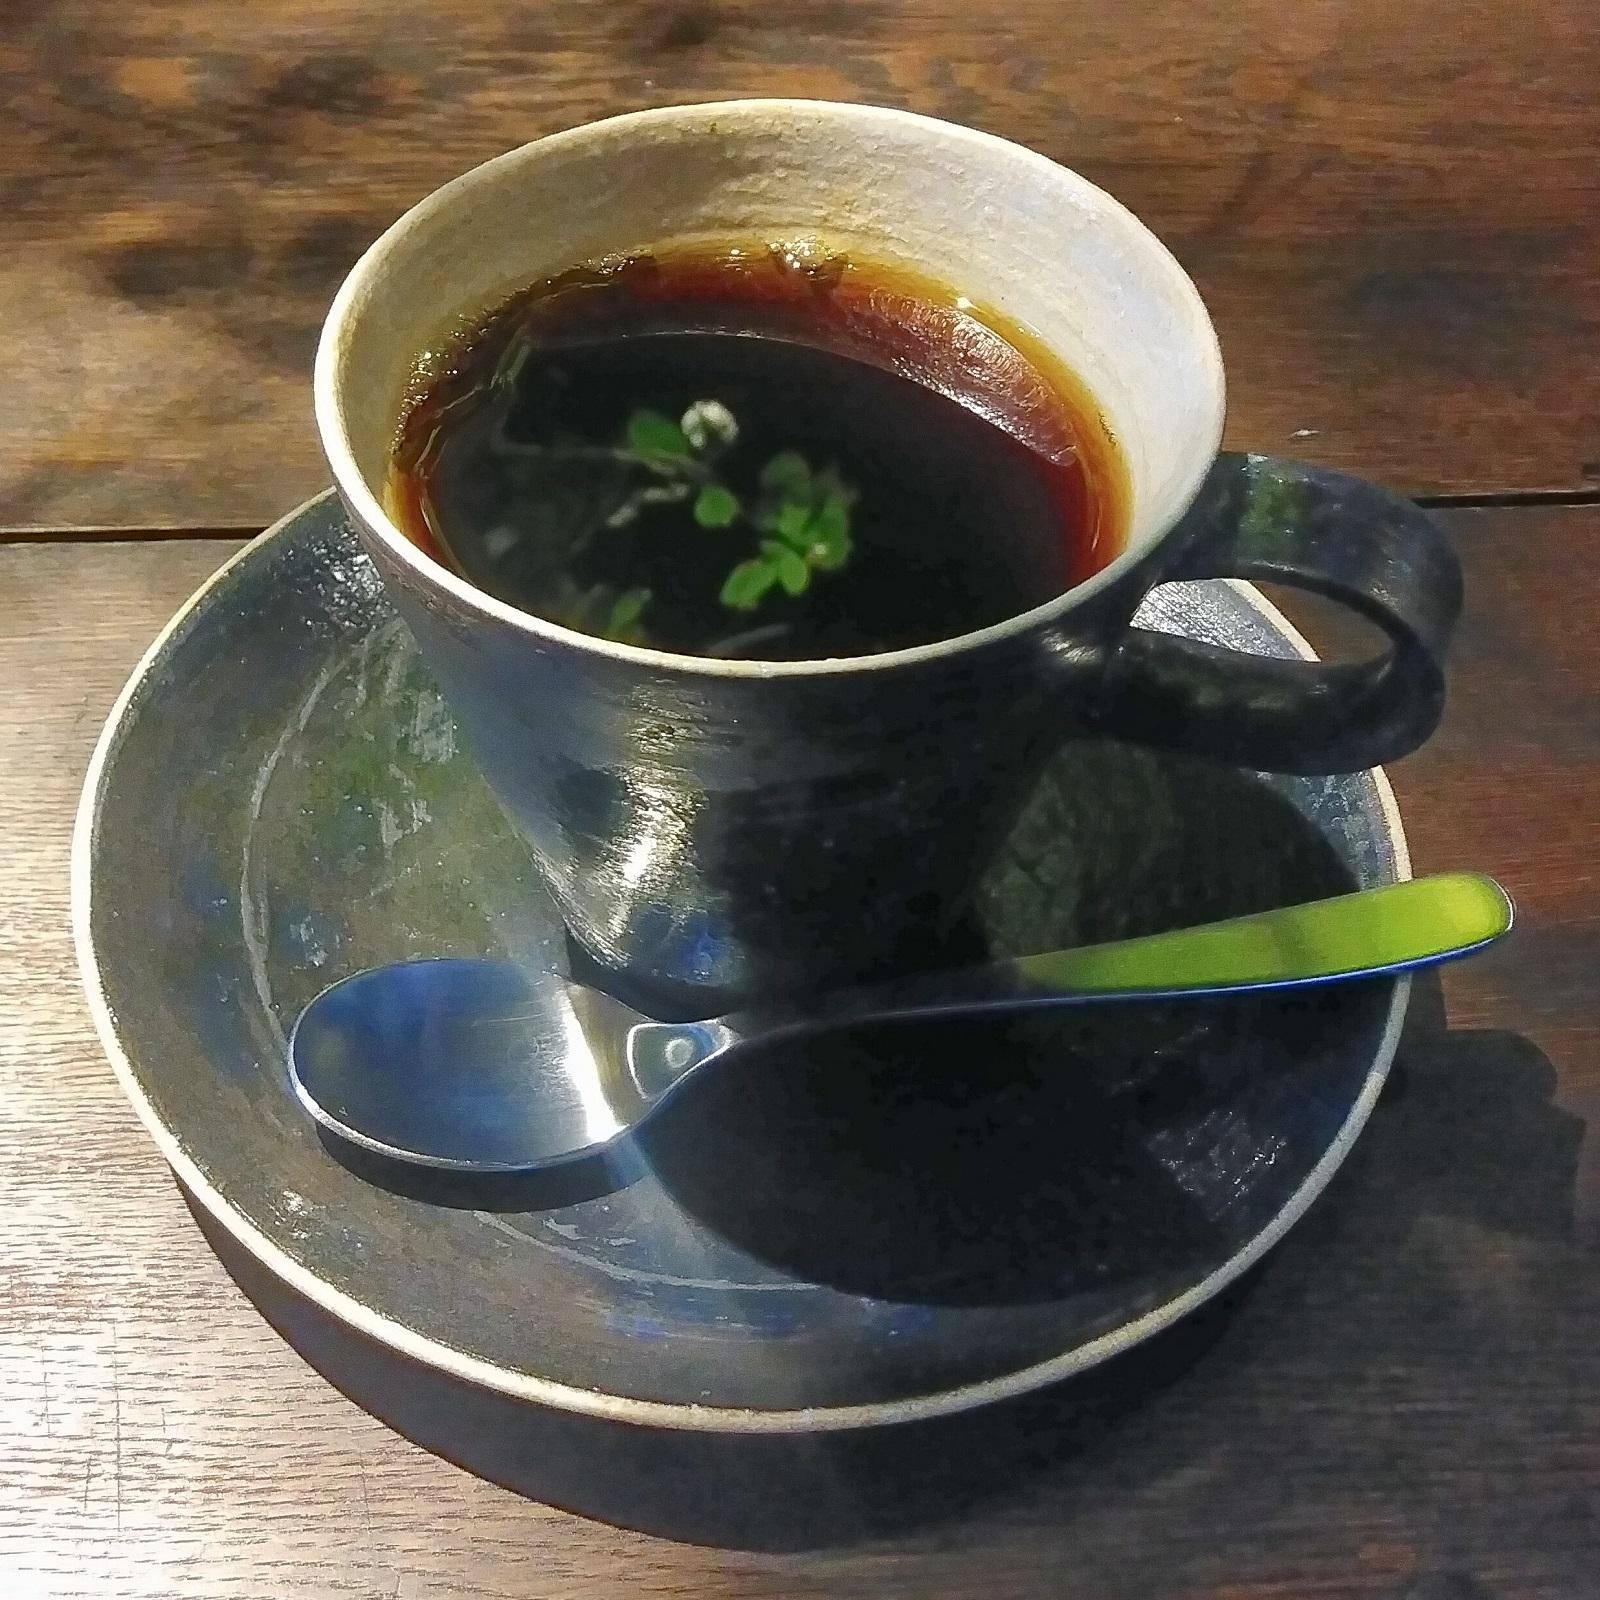 My coffee, a V60 of a Guatemalan single-origin, reflecting the greenery in Hirano Coffee, Nagano.